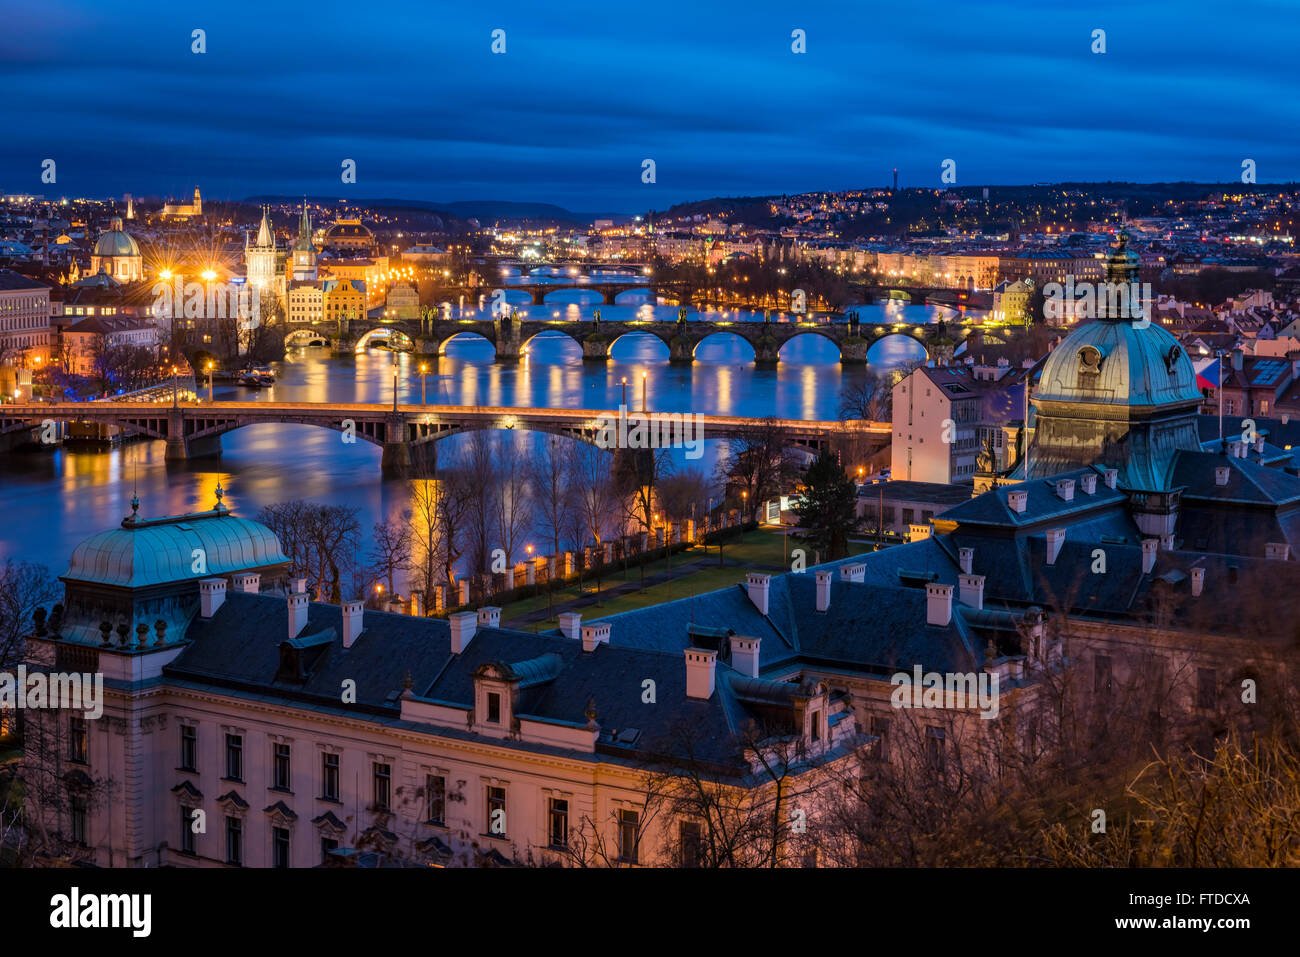 Prague at night with Vltava river view - Stock Image